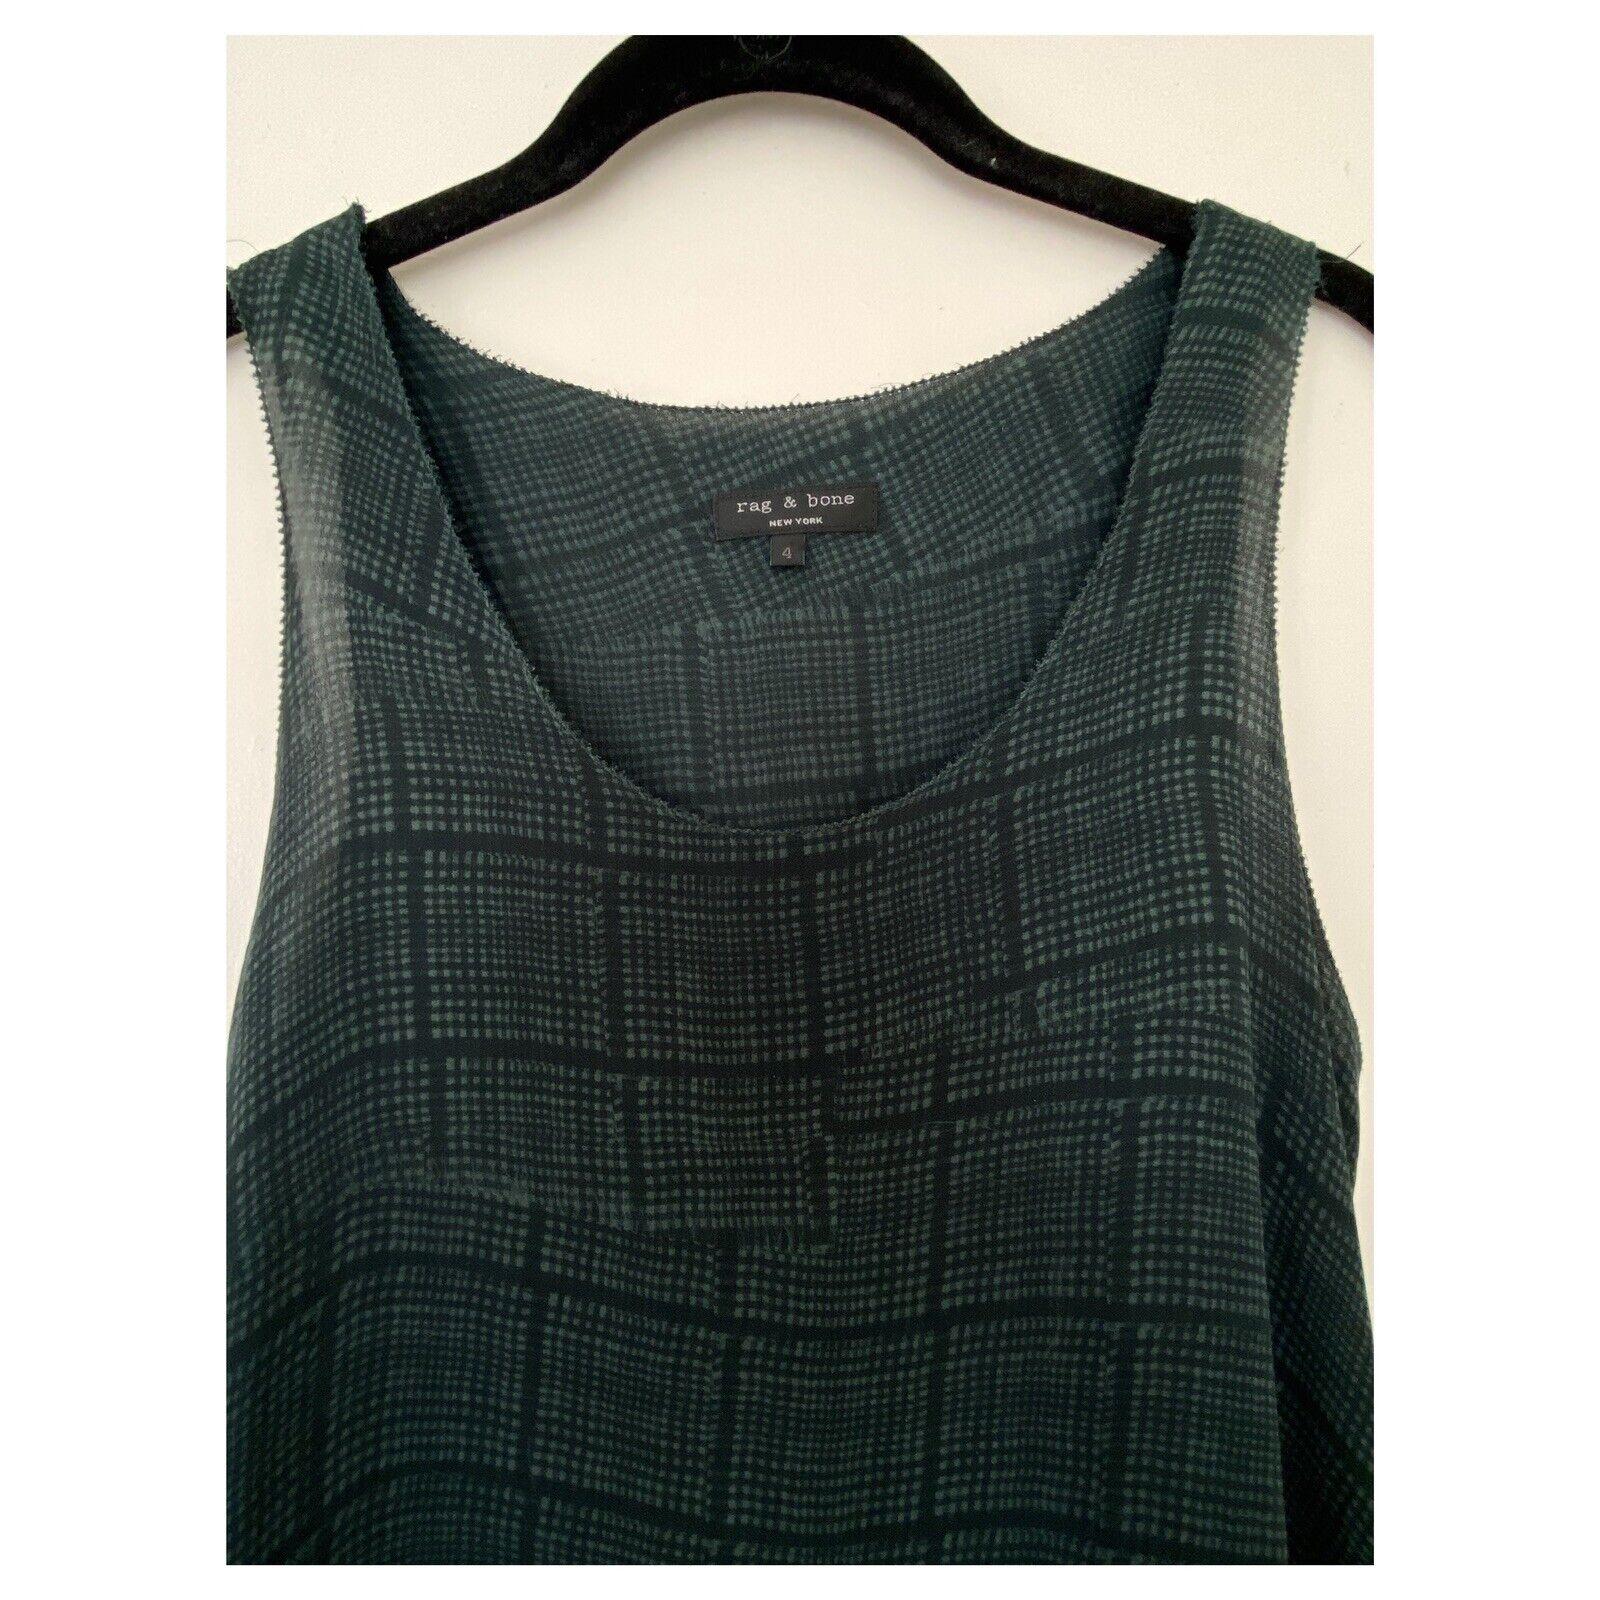 rag and bone silk blouse size 4 excellent conditi… - image 2